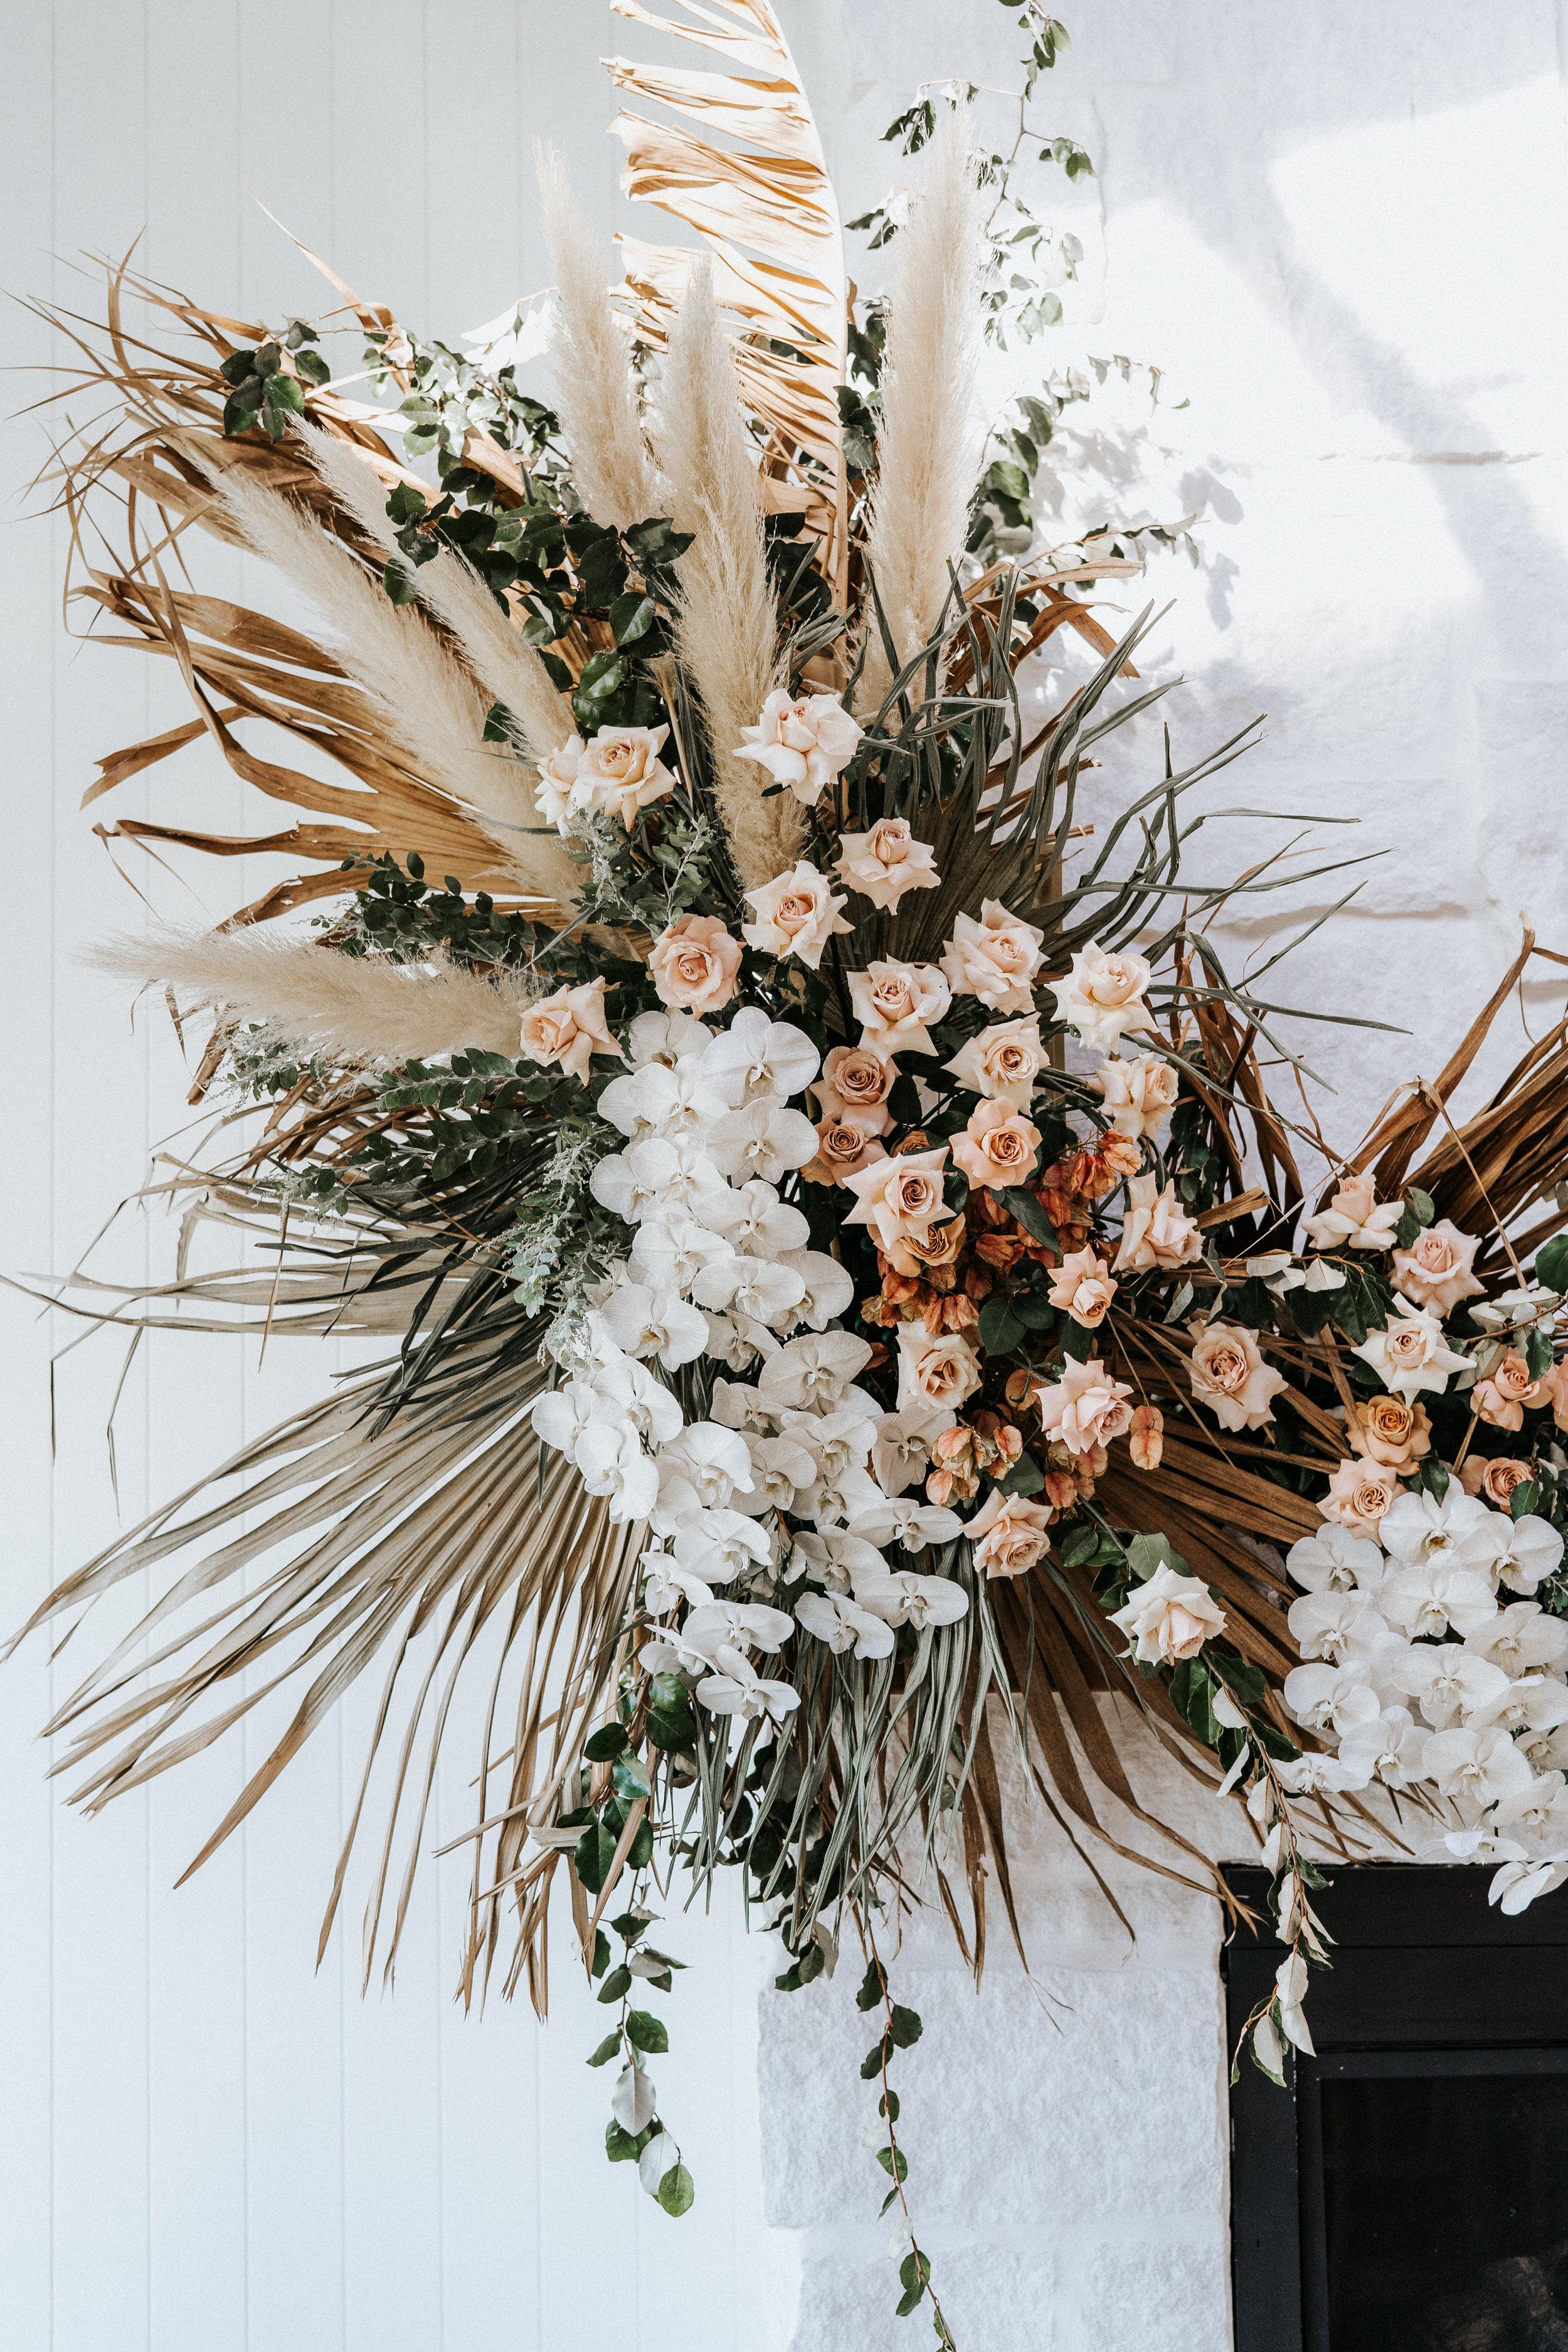 gemaya-tim-bilmon-wedding-14.jpg